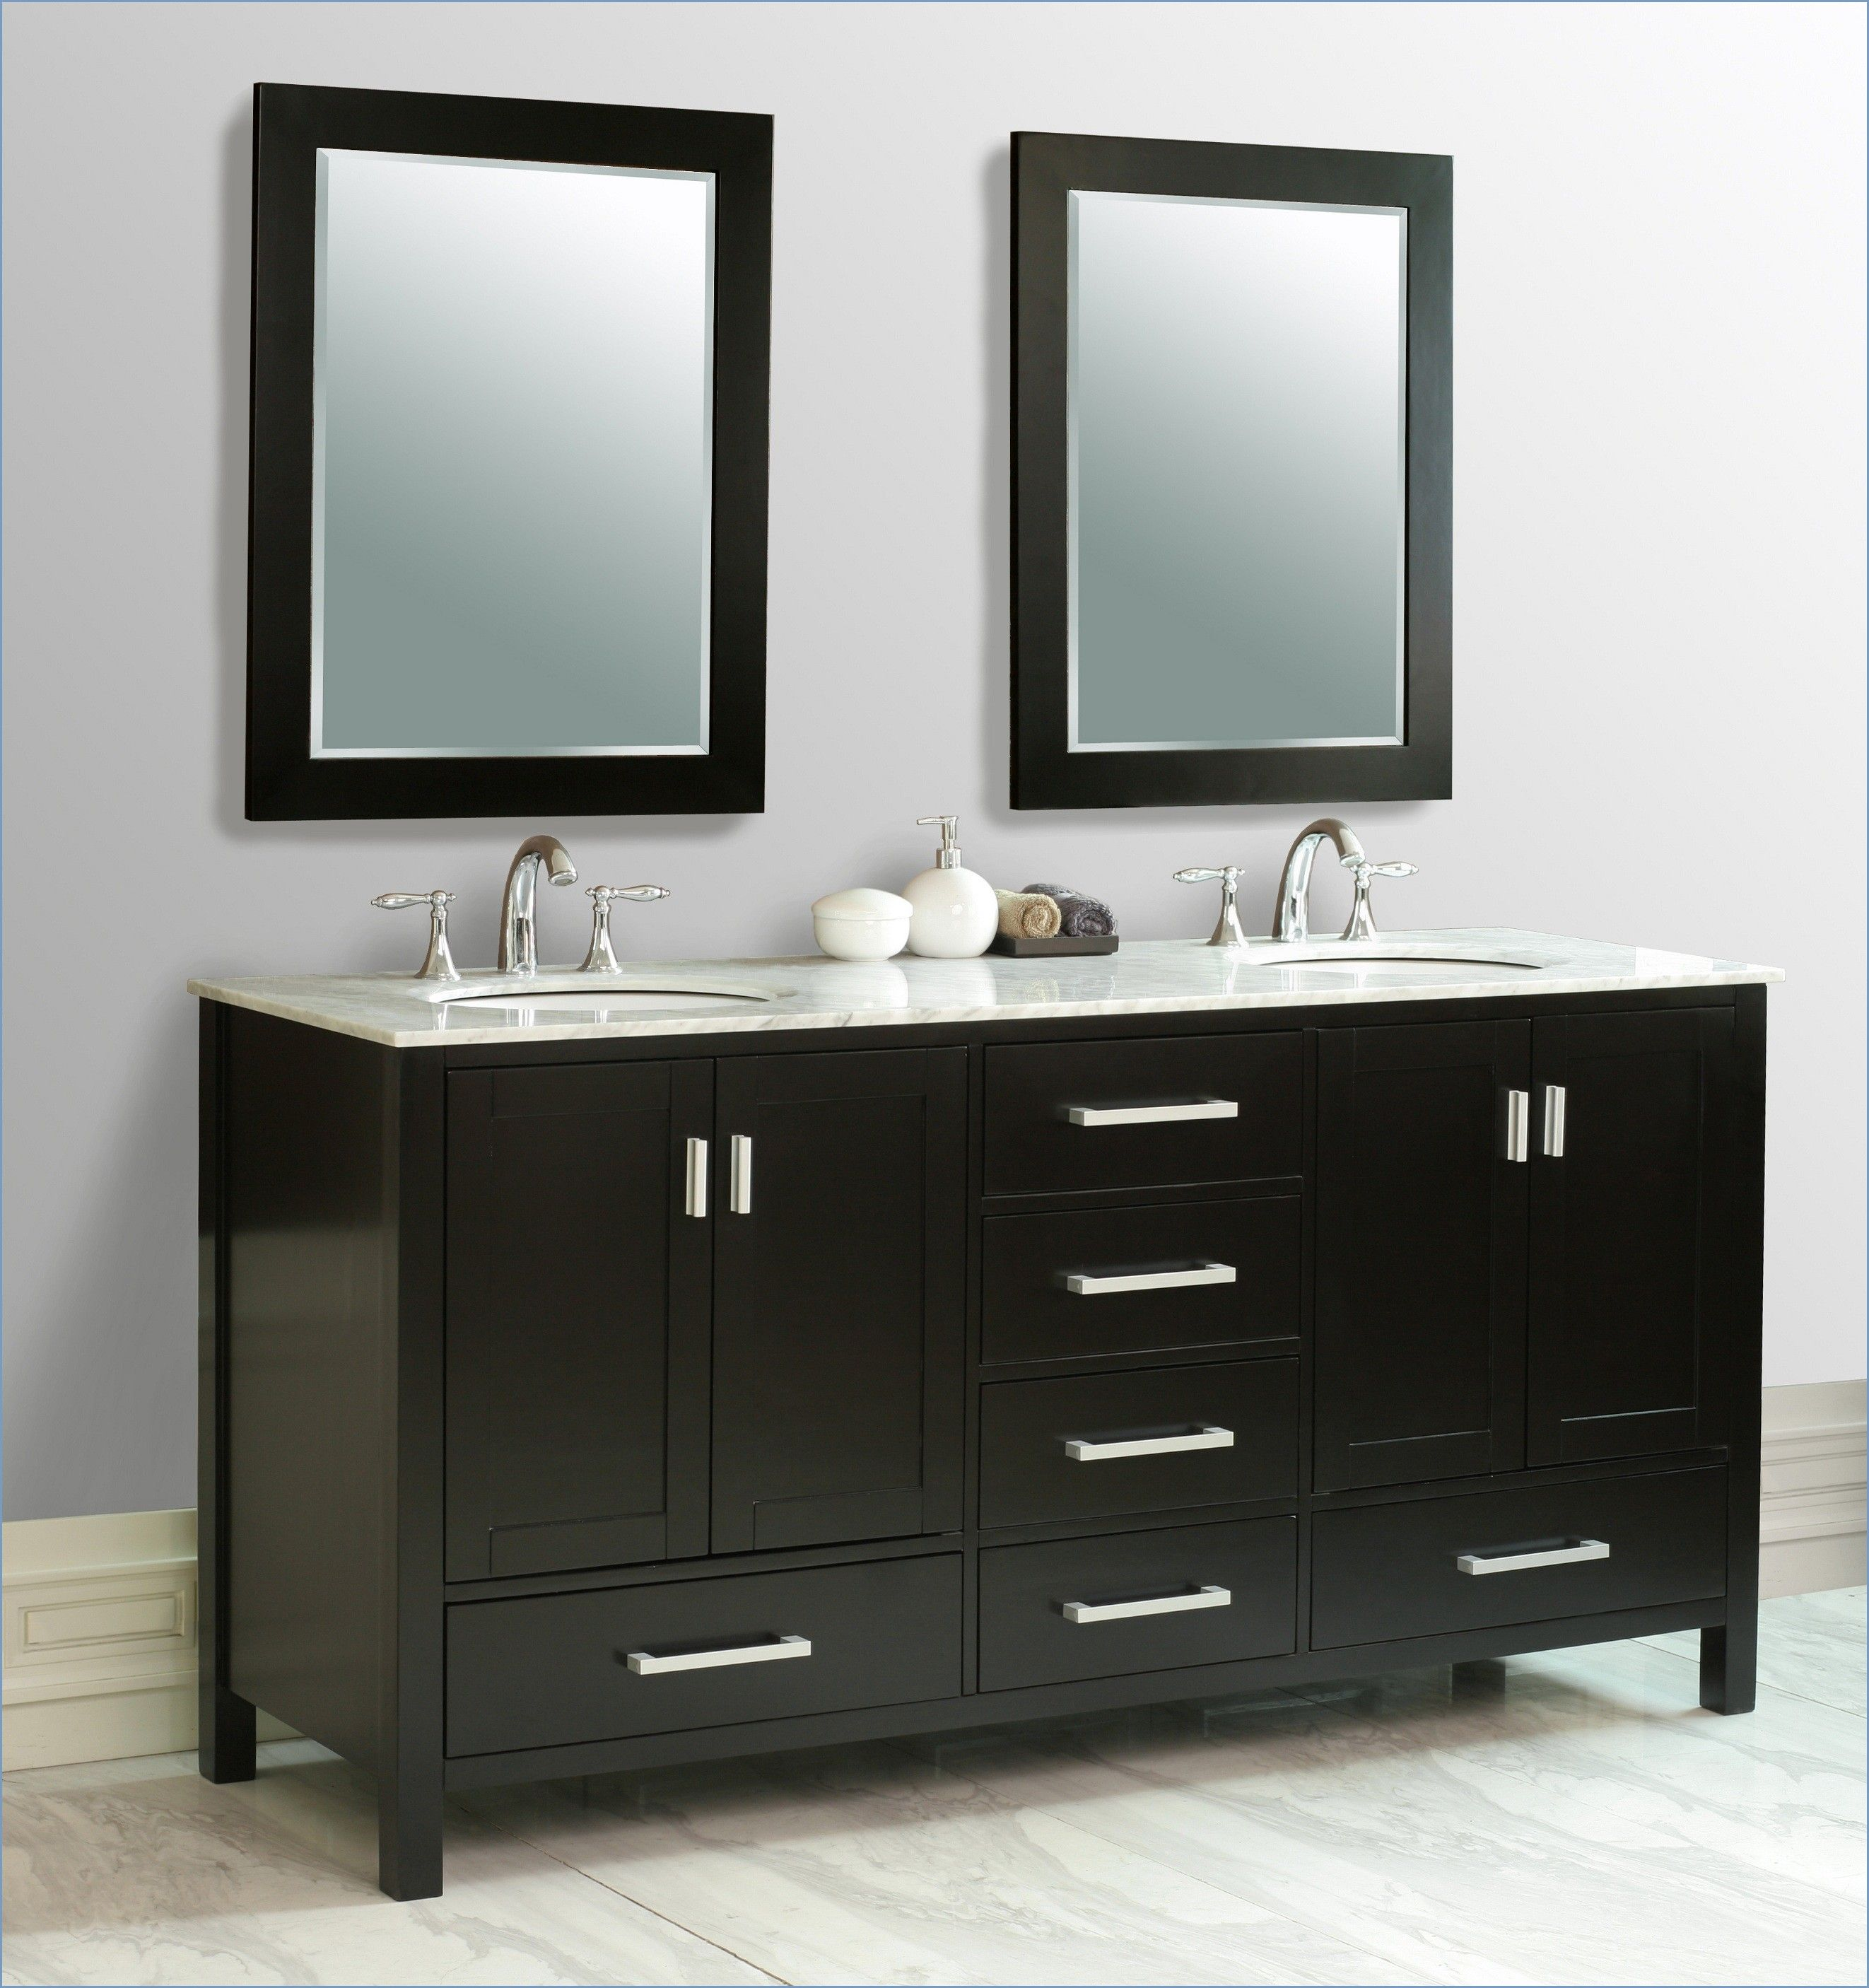 new bathroom images%0A doublesinkvanitytopsnewdoublesinkideas